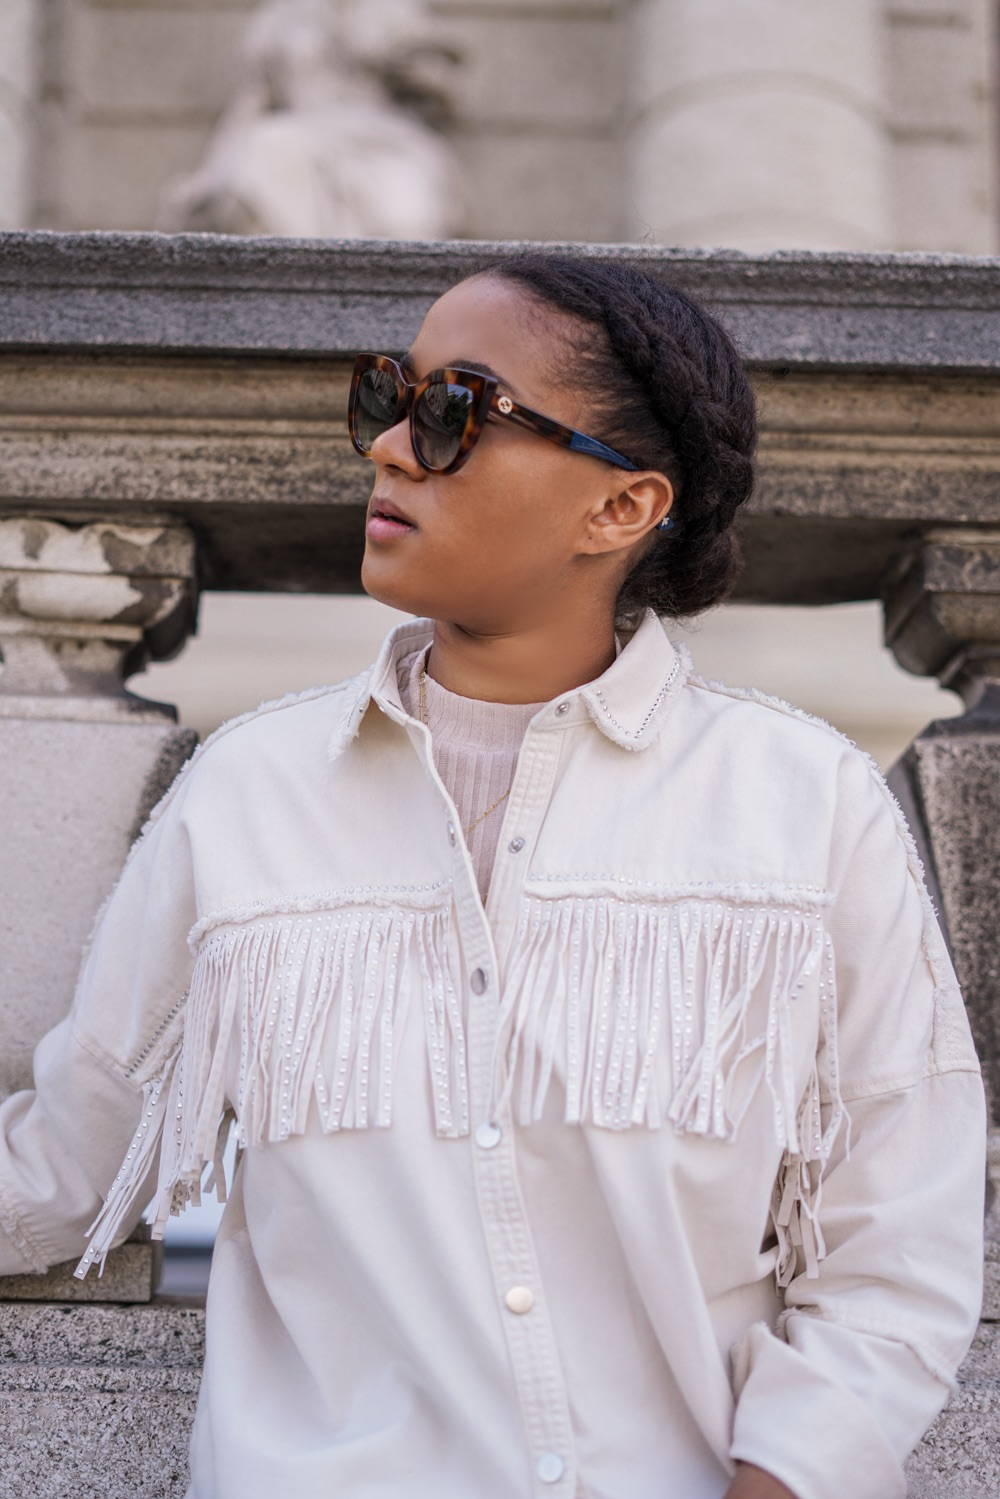 Top german fashionblogger Fransenjacke fringe jacket